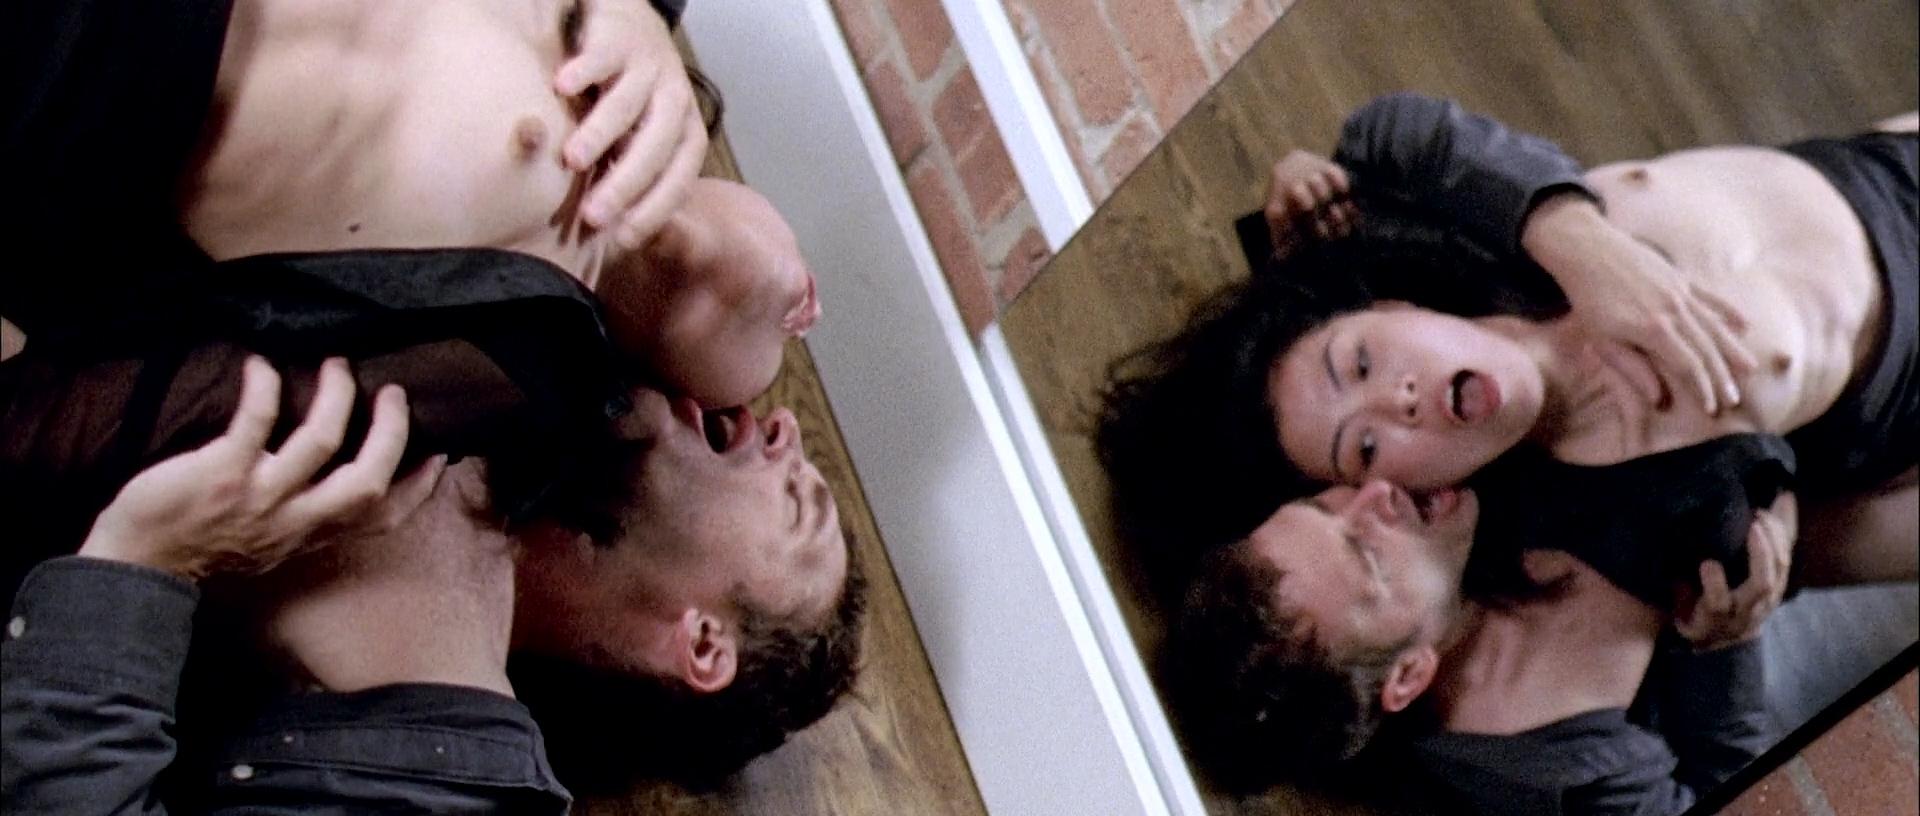 Morena Baccarin nude topless, Vanessa Kai nude sex - Death in Love (2008) hd 1080p Bluray (2)